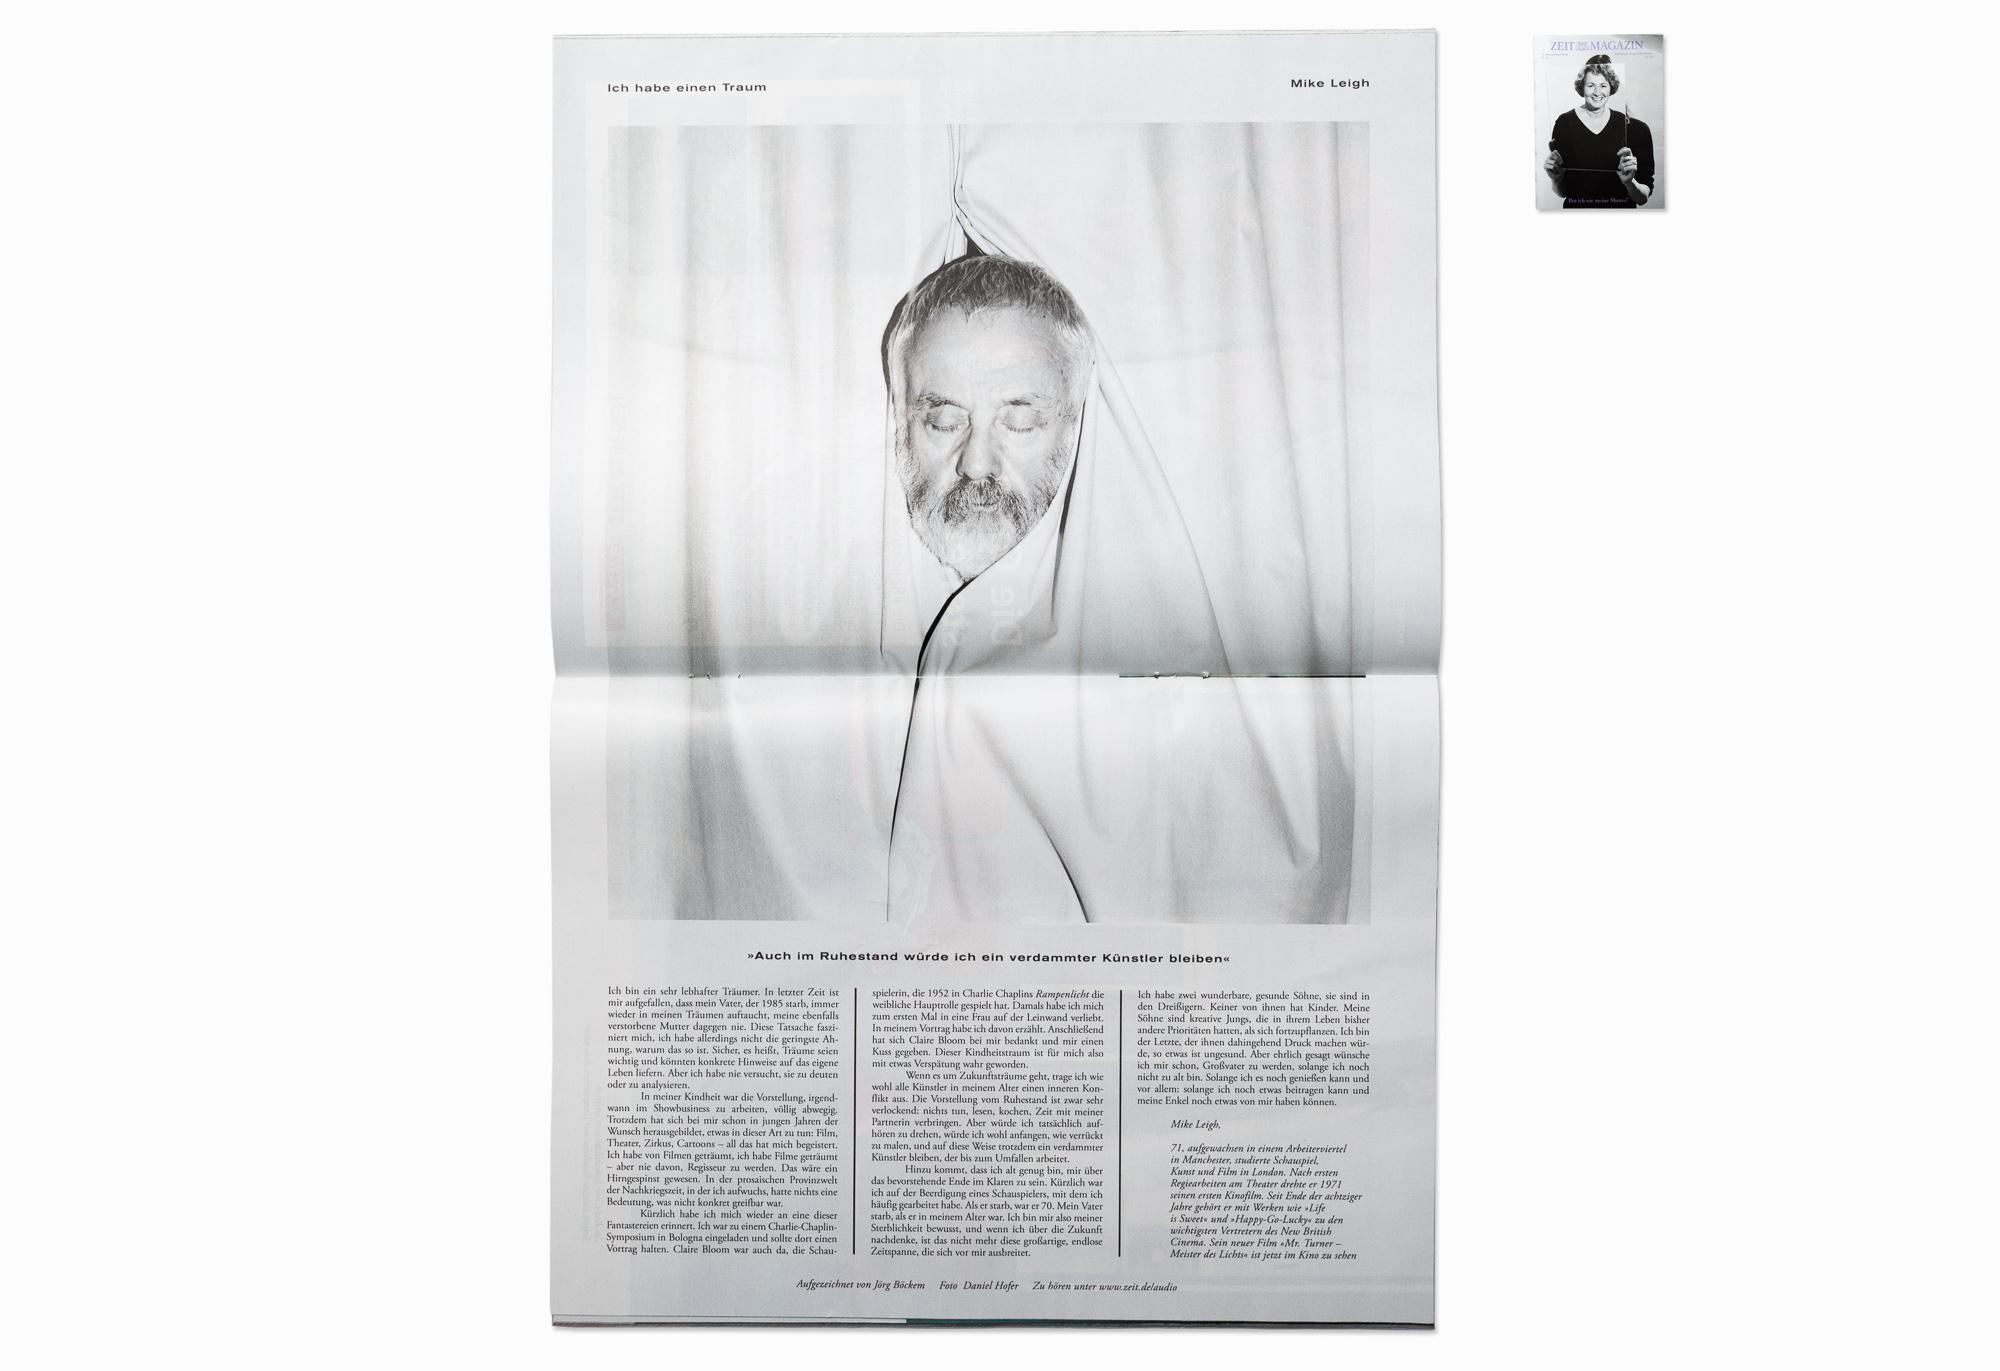 Director Mike Leigh for ZEIT Magazine, Berlin 2014